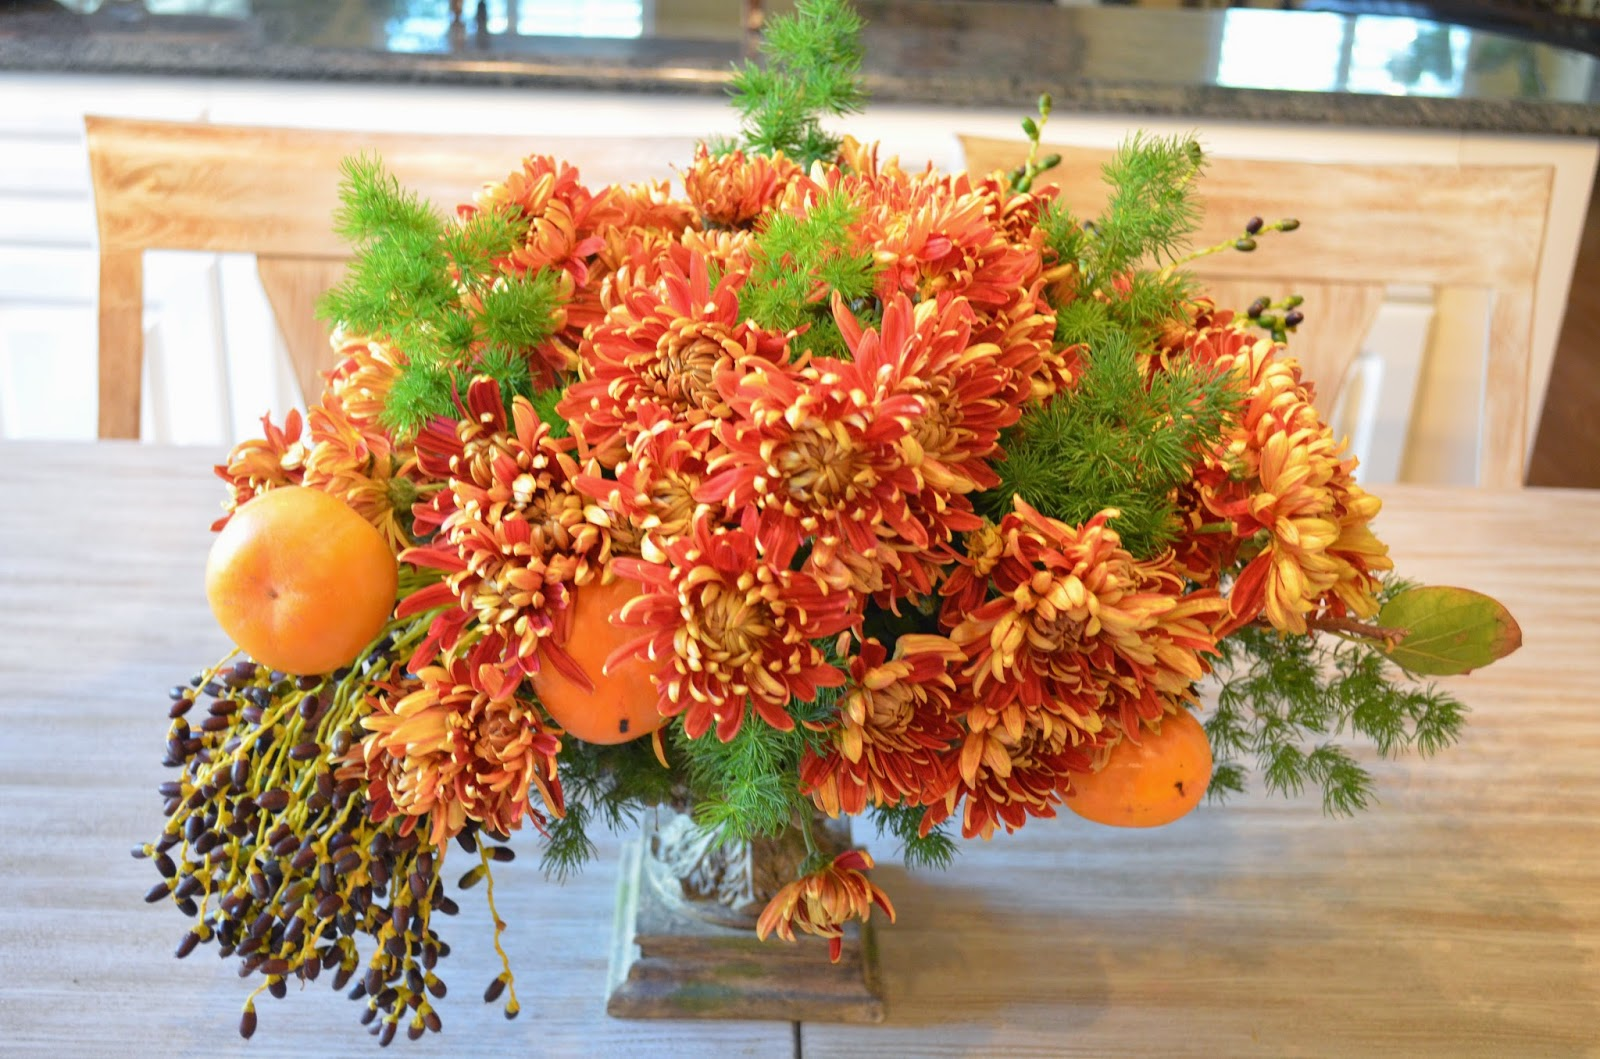 Entertaining From an Ethnic Indian Kitchen Fall flower arrangement